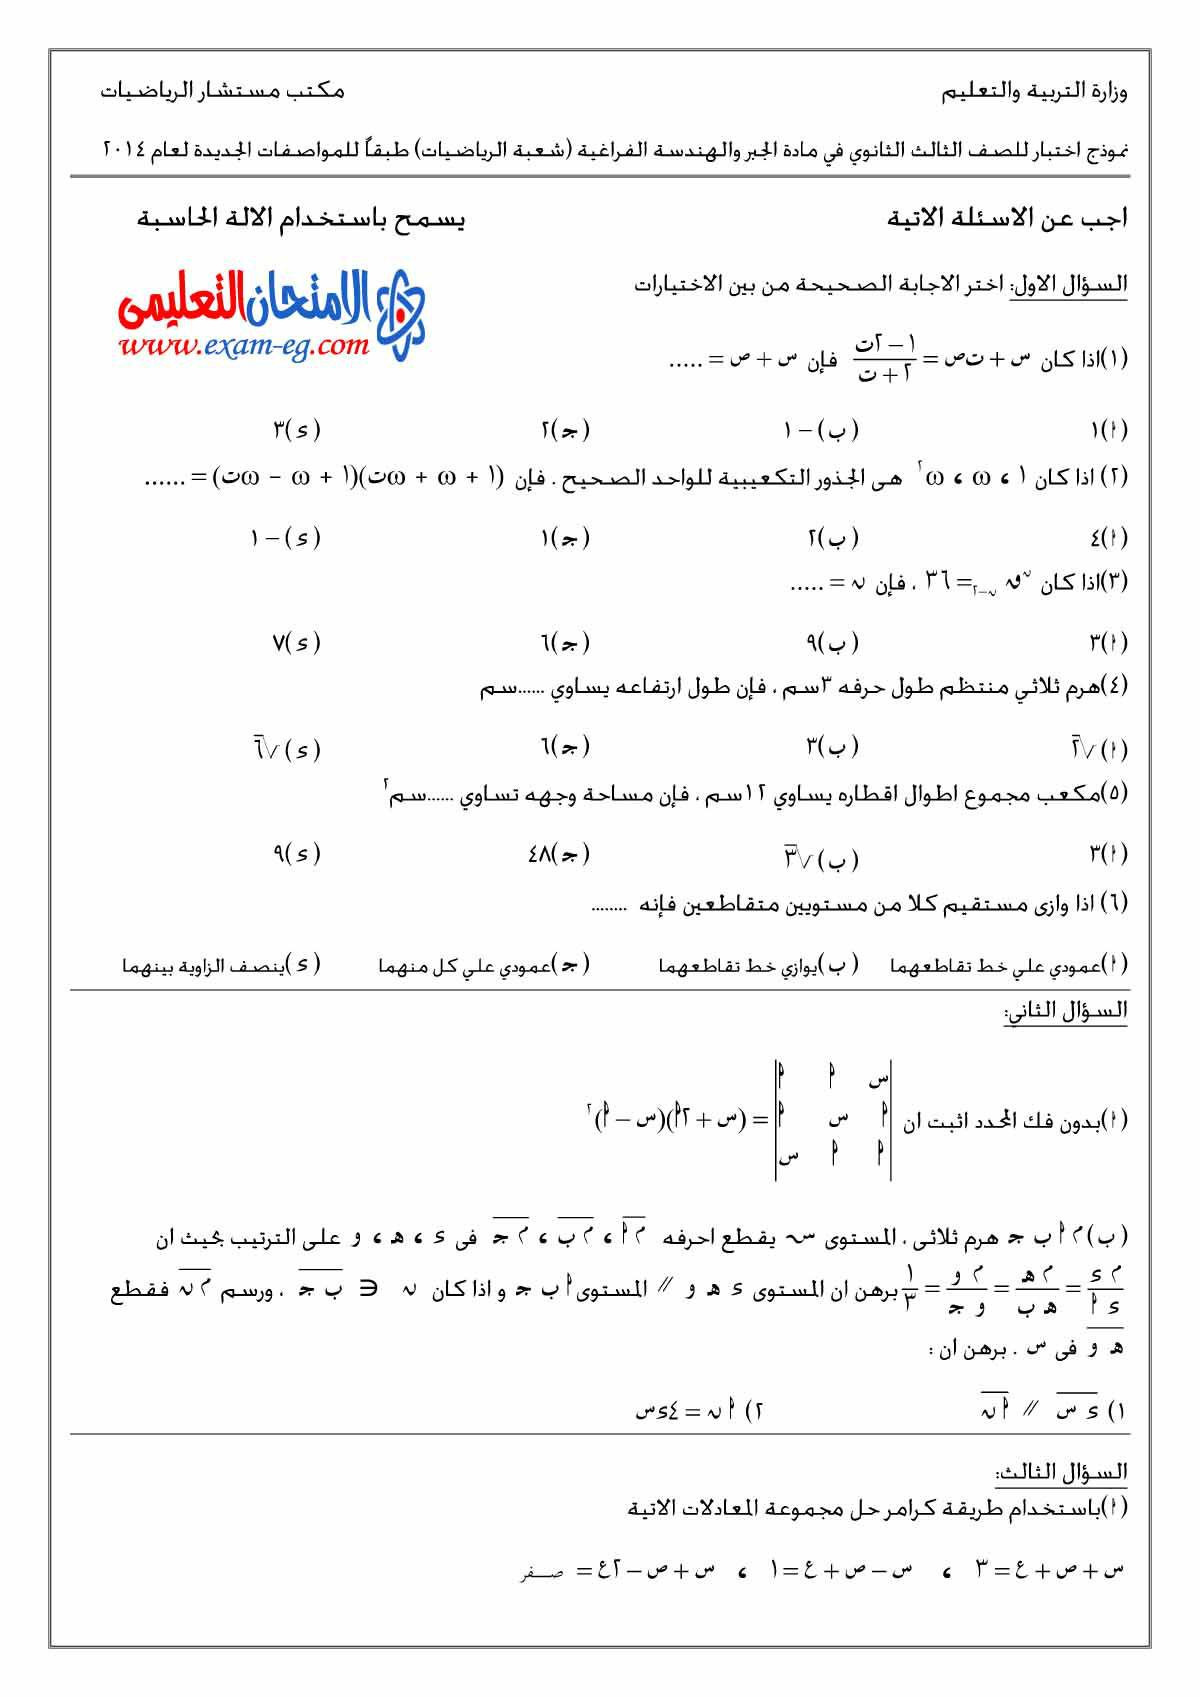 exam-eg.com_1403332539553.jpg